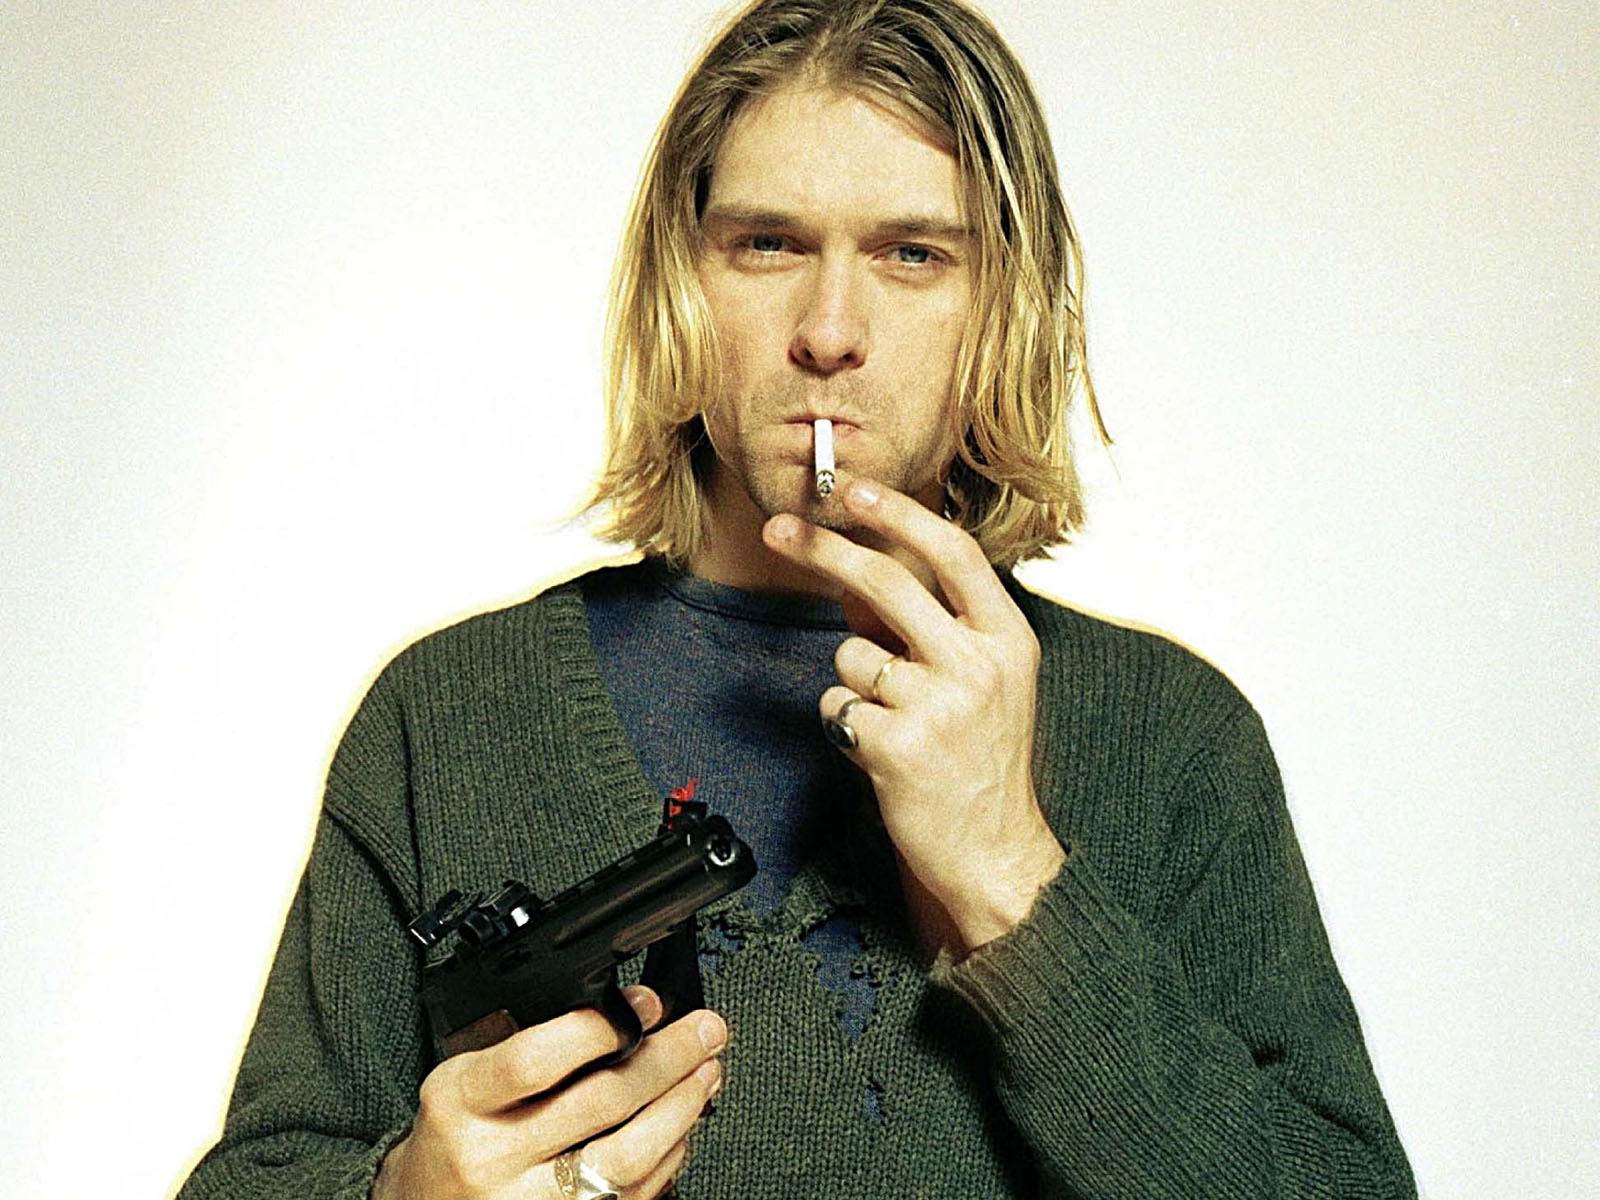 ... Kurt Cobain; Kurt Cobain